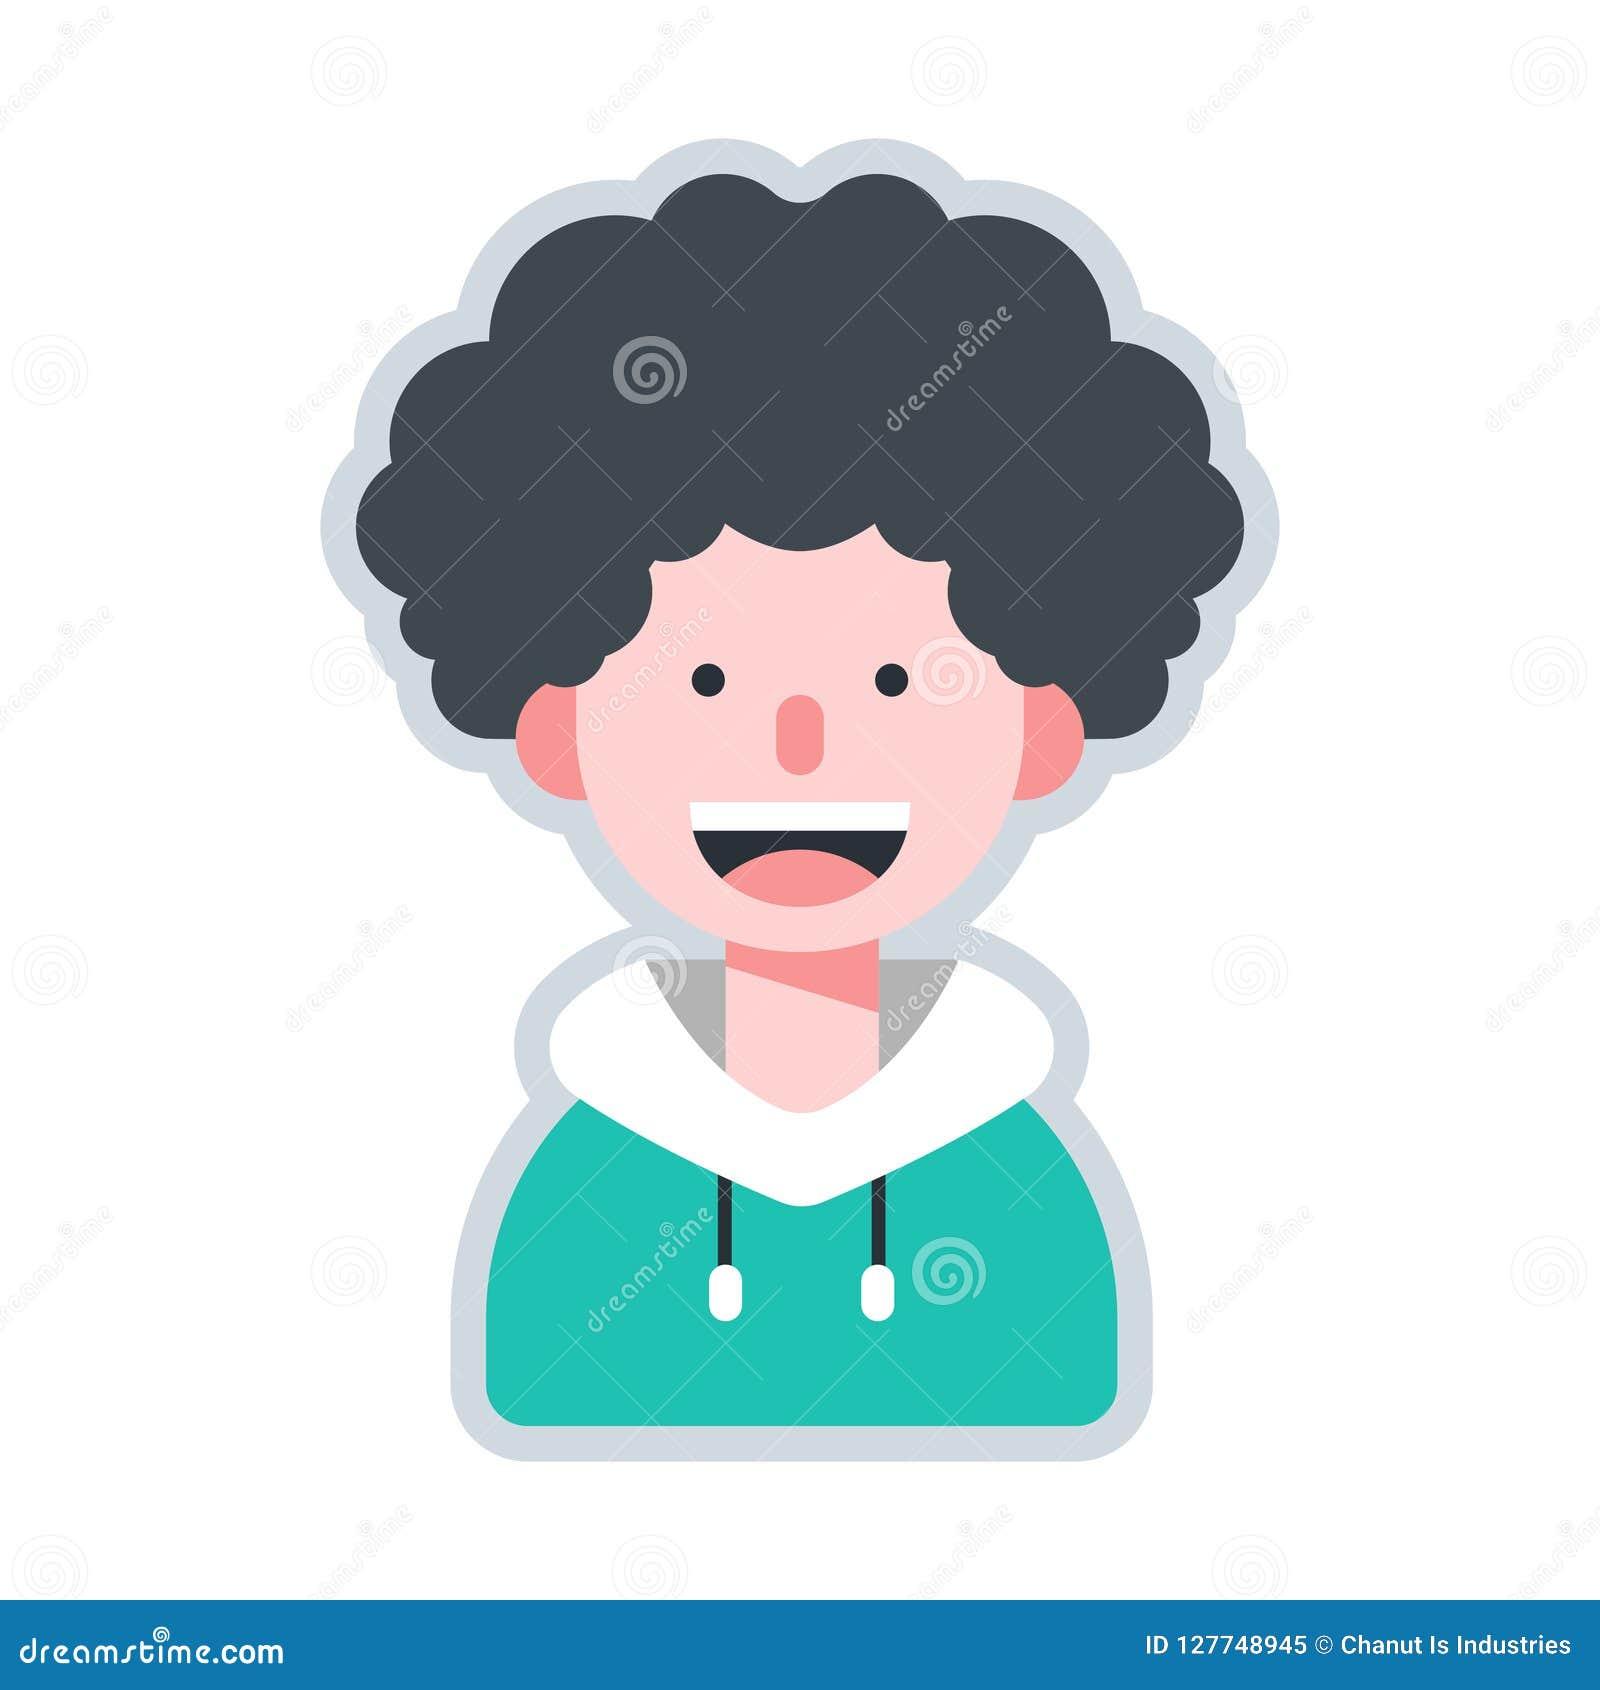 Avatar Curly Hair Flat Illustration Stock Vector Illustration Of